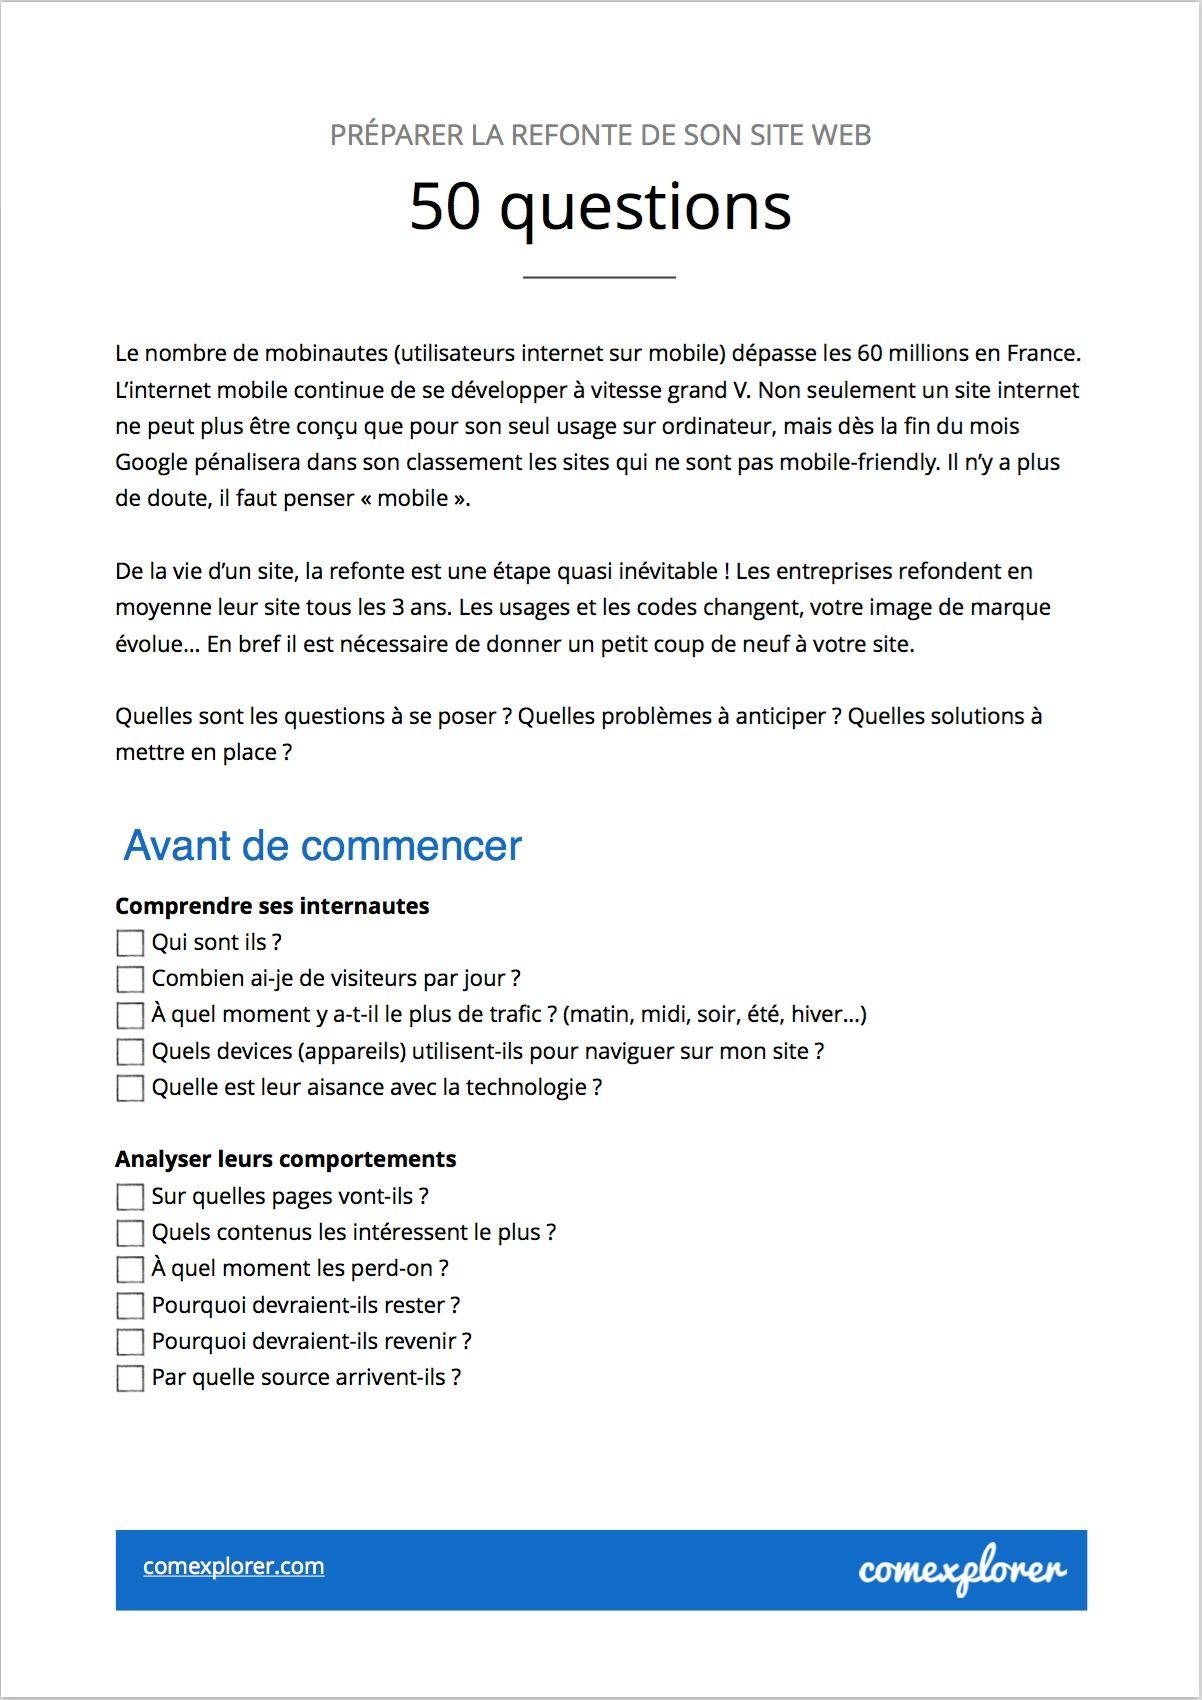 Check-list refonte site web